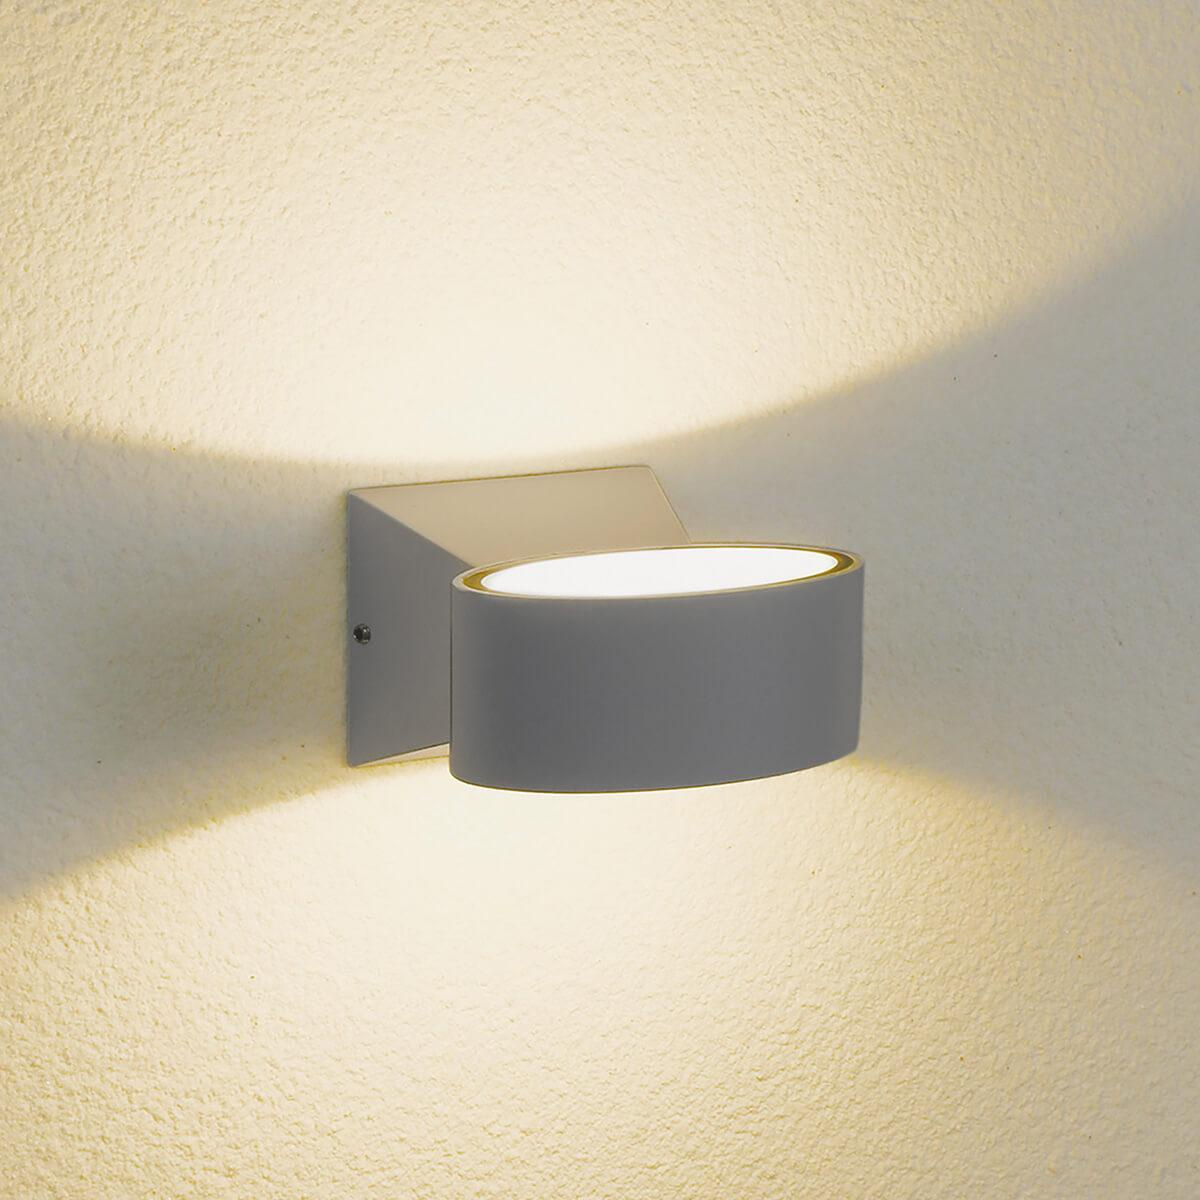 Уличный светильник Elektrostandard 4690389106316, LED уличный настенный светодиодный светильник elektrostandard 1605 techno led sokar графит 4690389086038